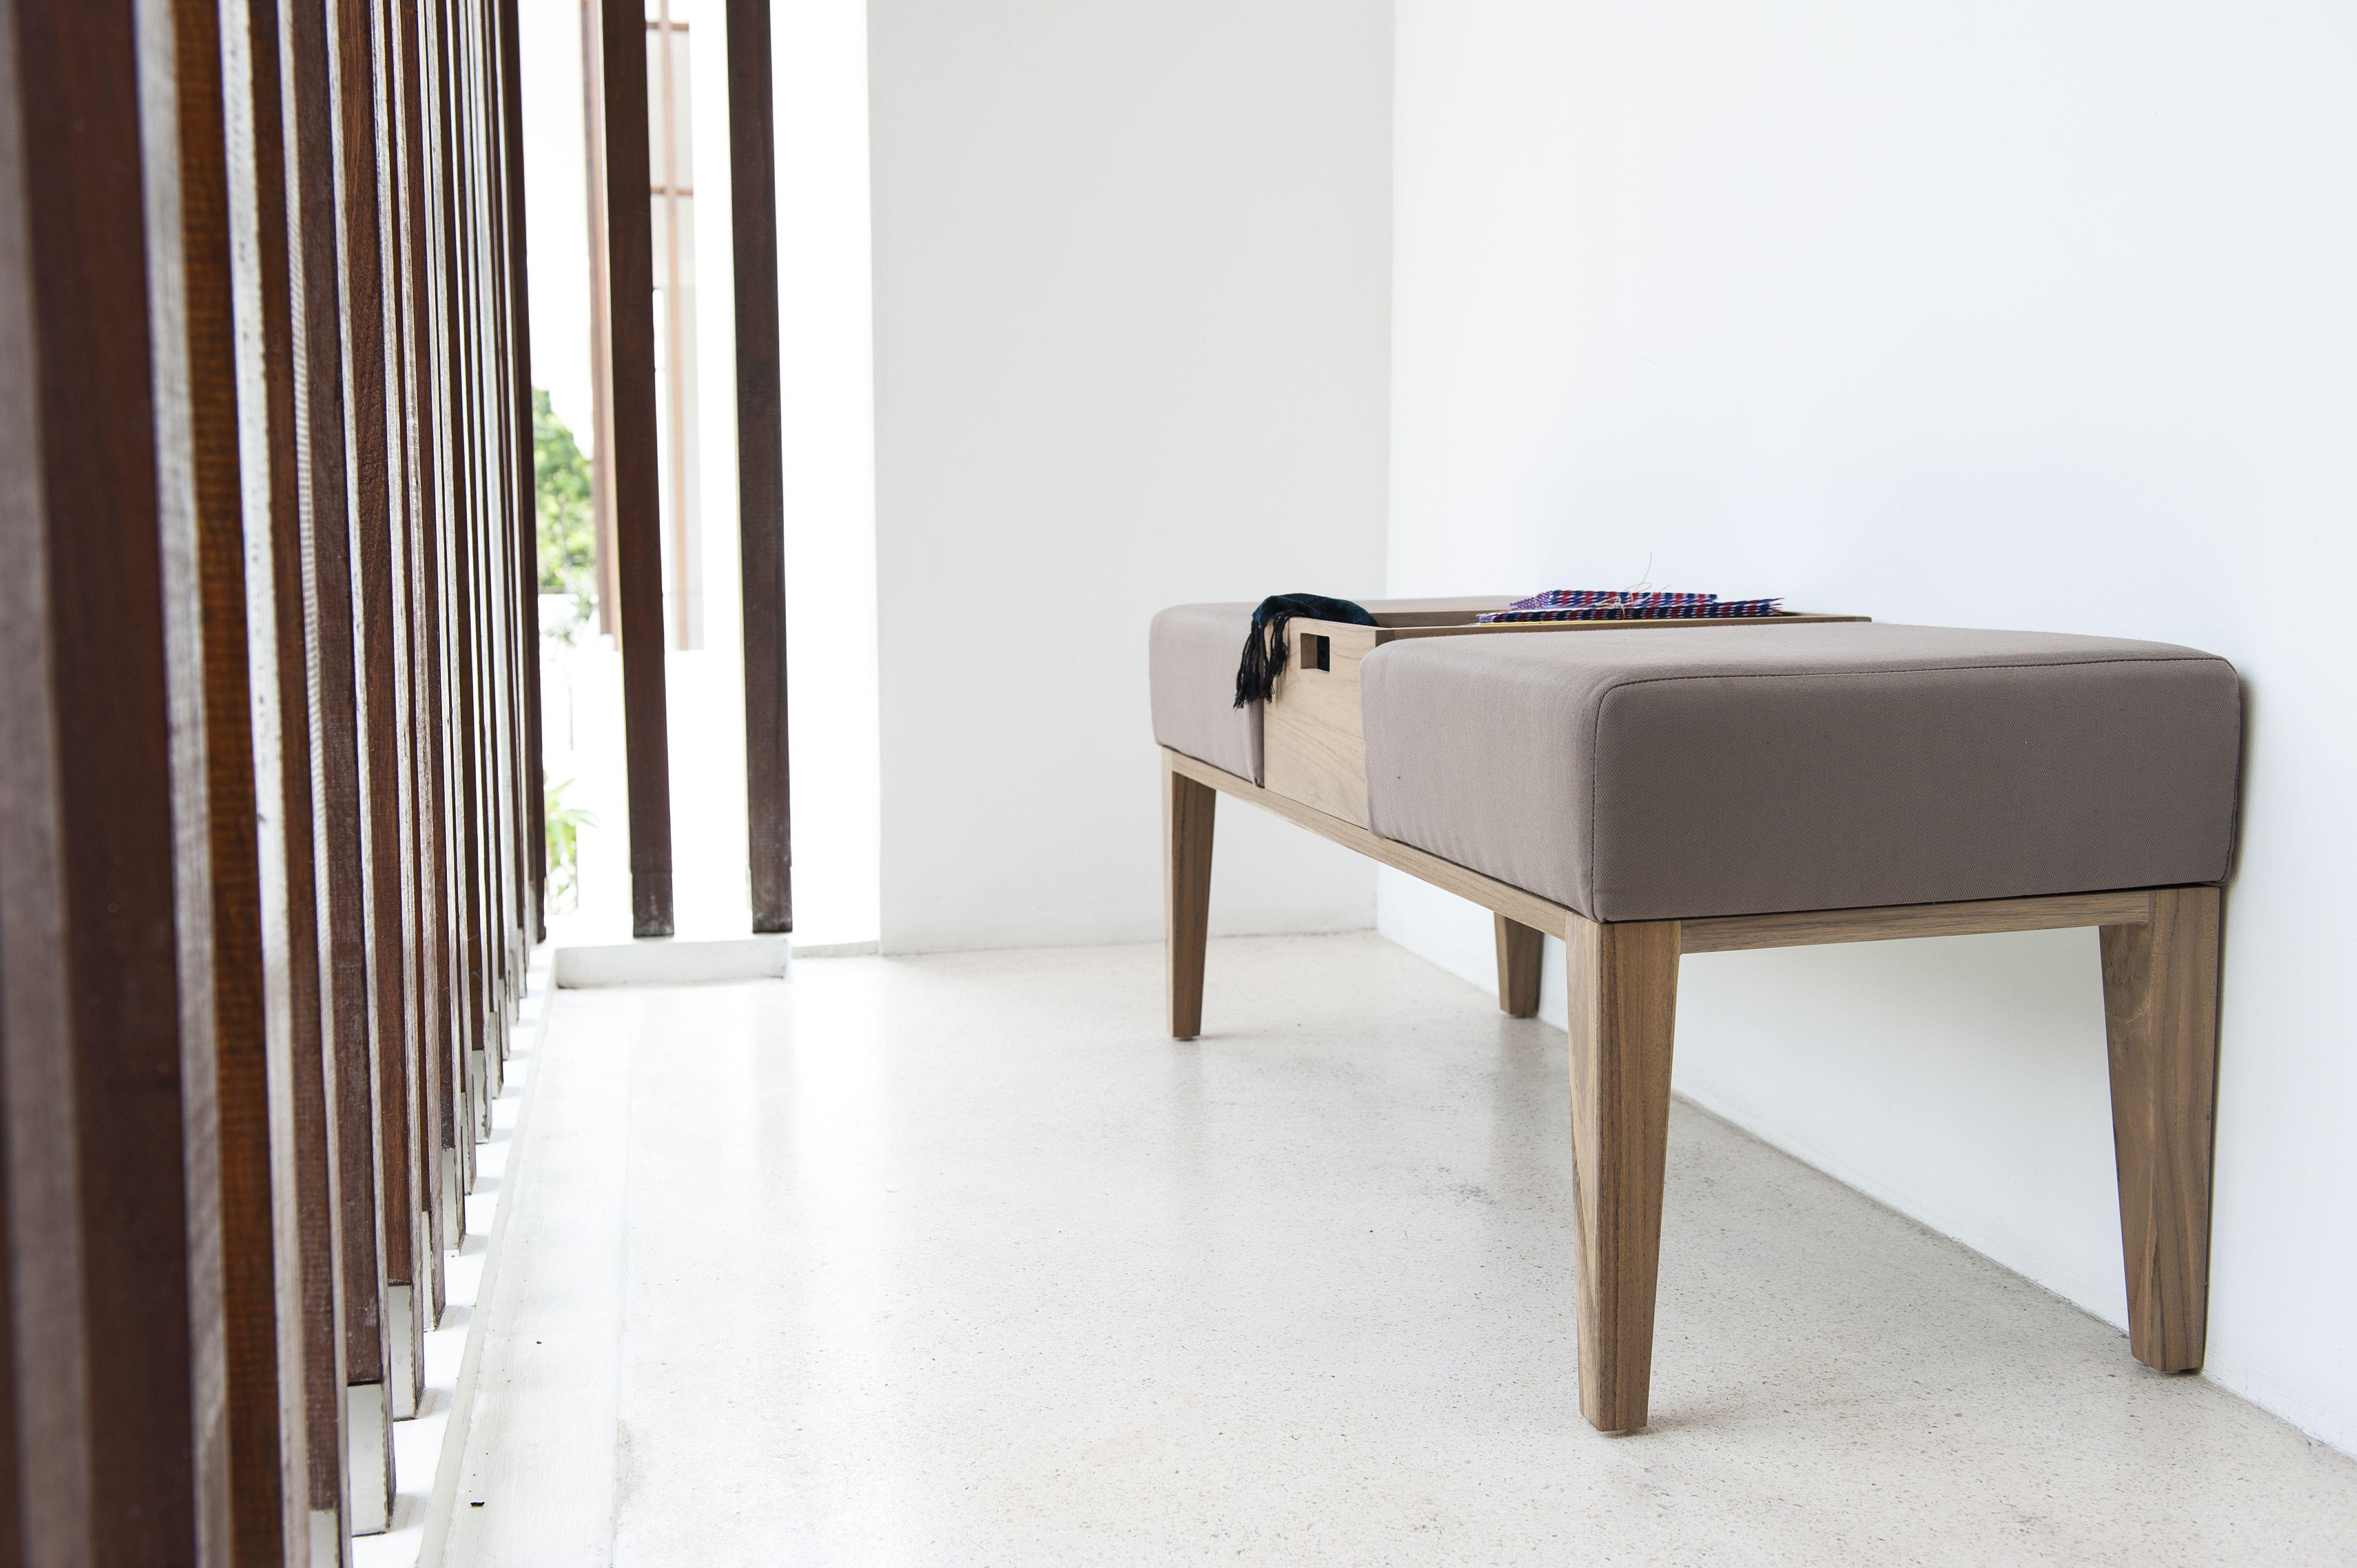 jill jim bench anna docherty design anna docherty design pinterest furniture. Black Bedroom Furniture Sets. Home Design Ideas